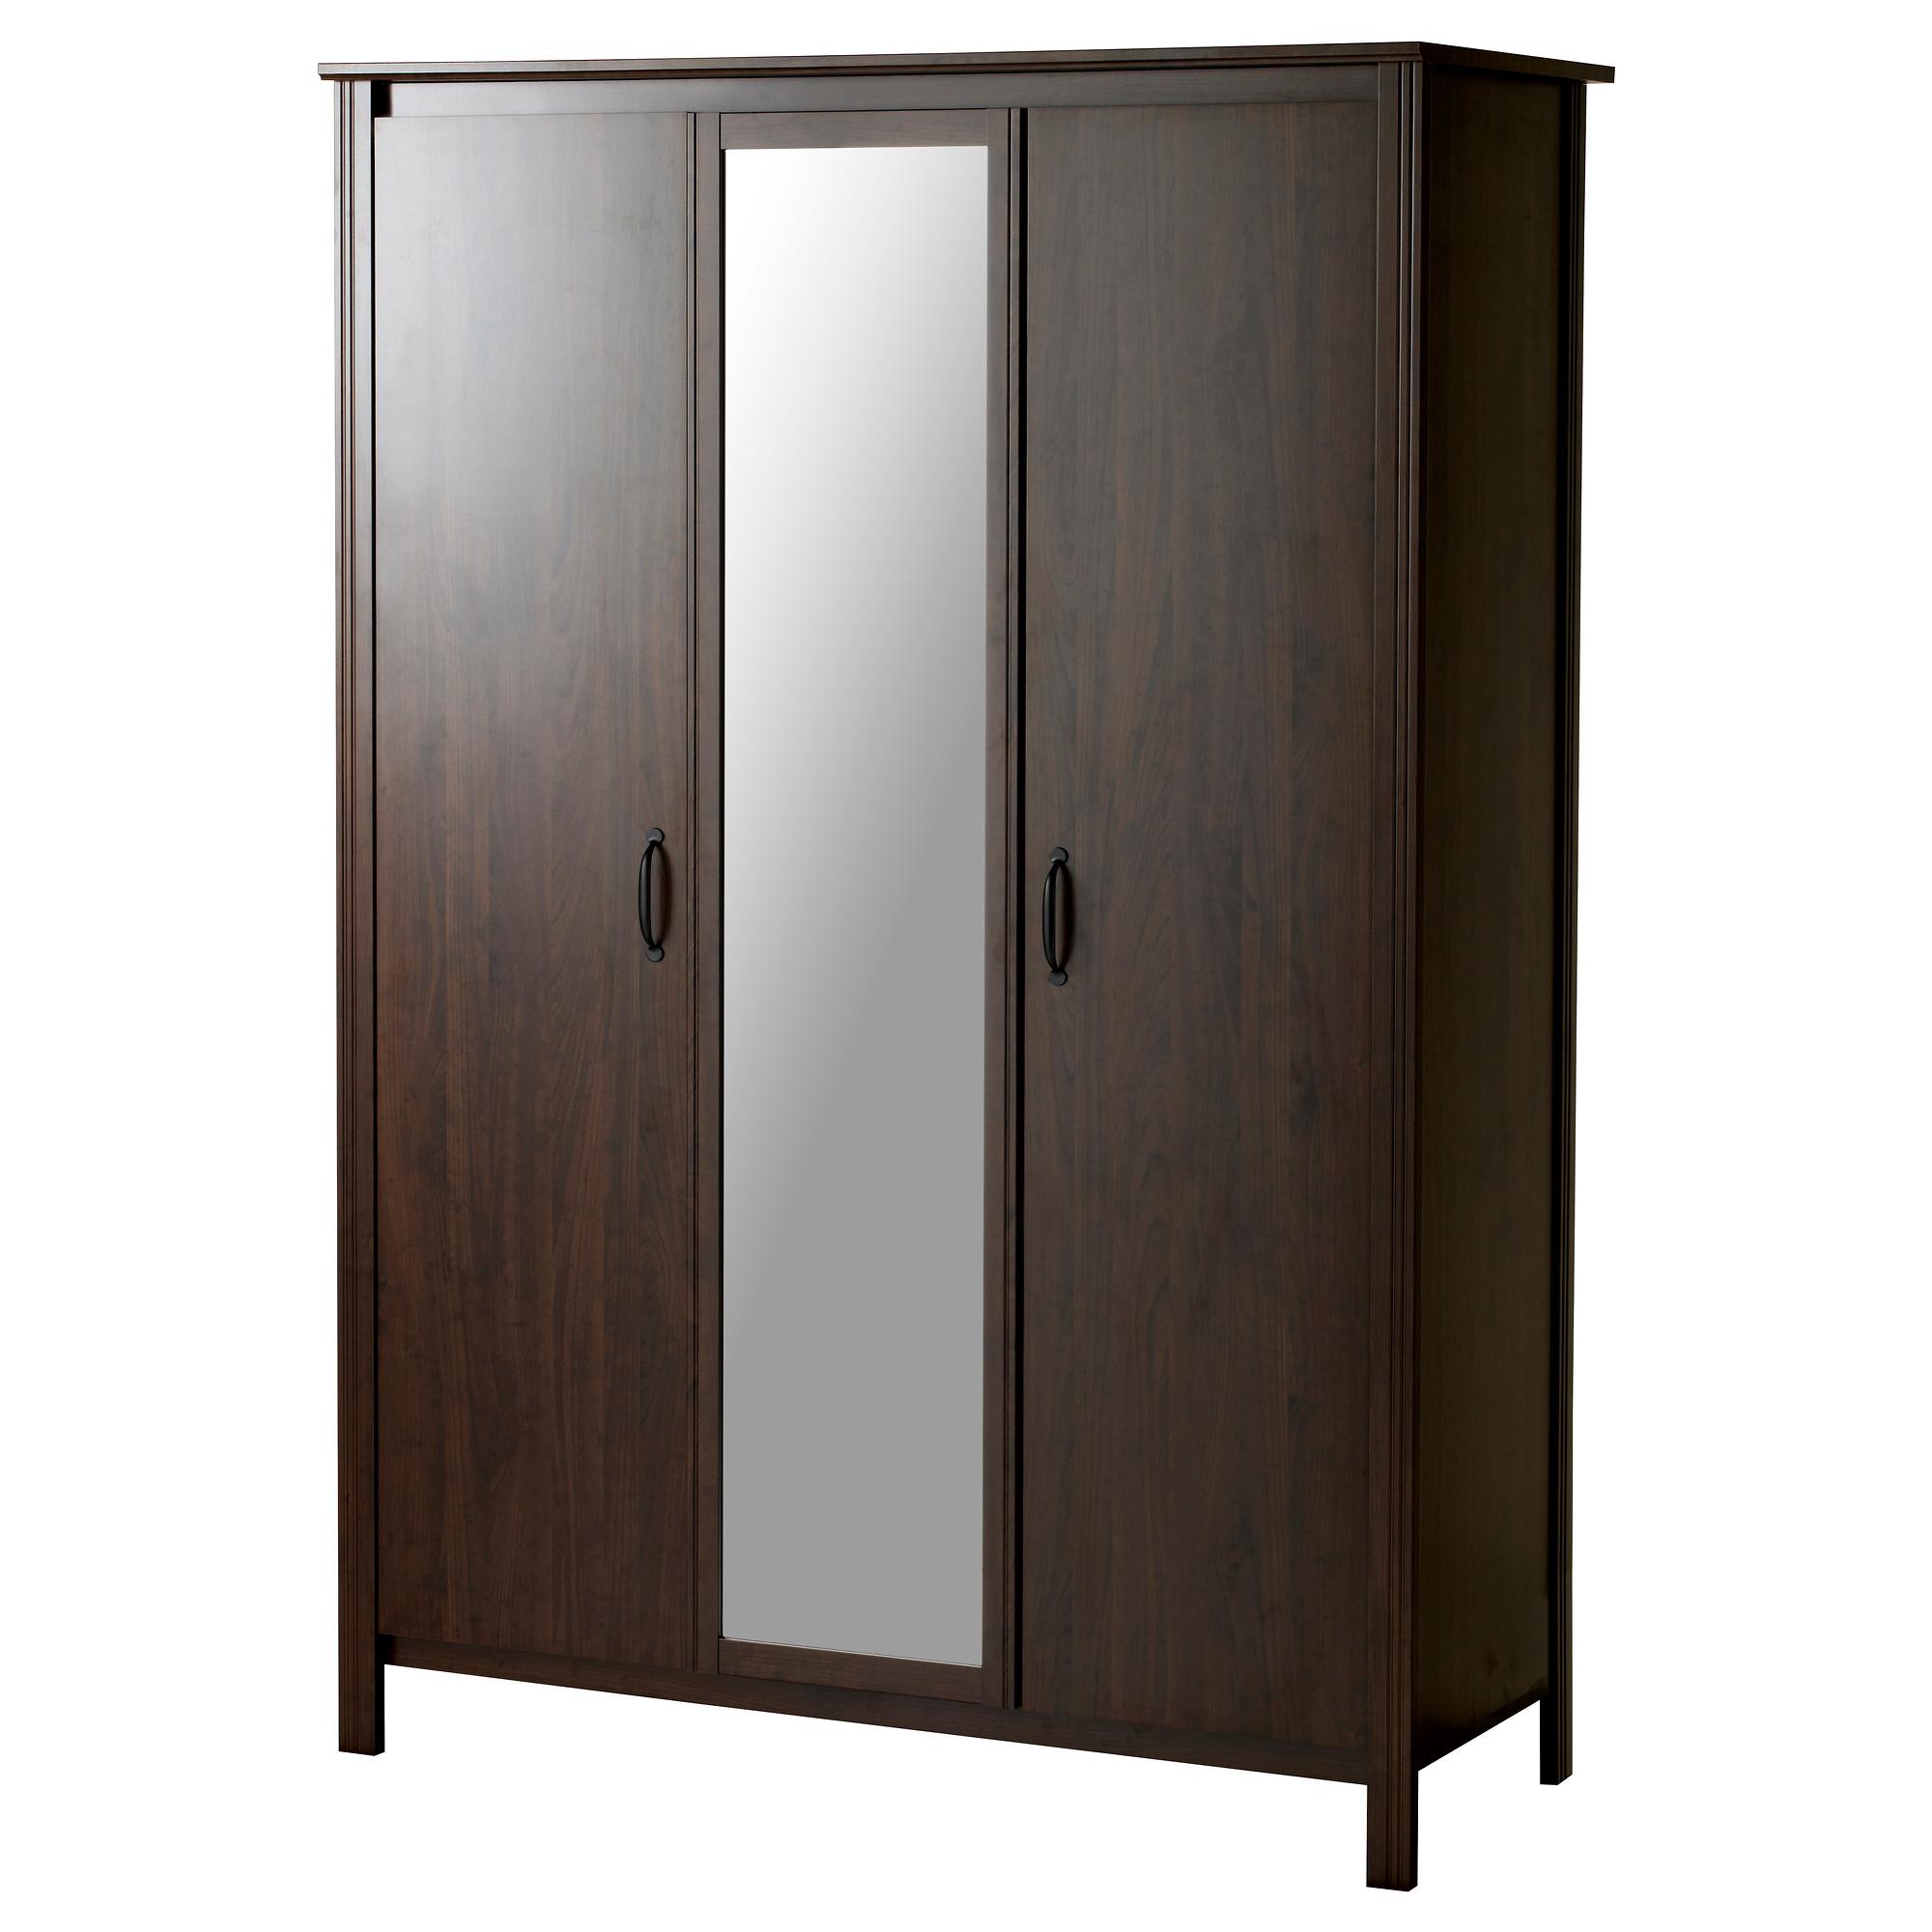 Elegant BRUSALI Wardrobe with 3 doors - IKEA portable wardrobe ikea